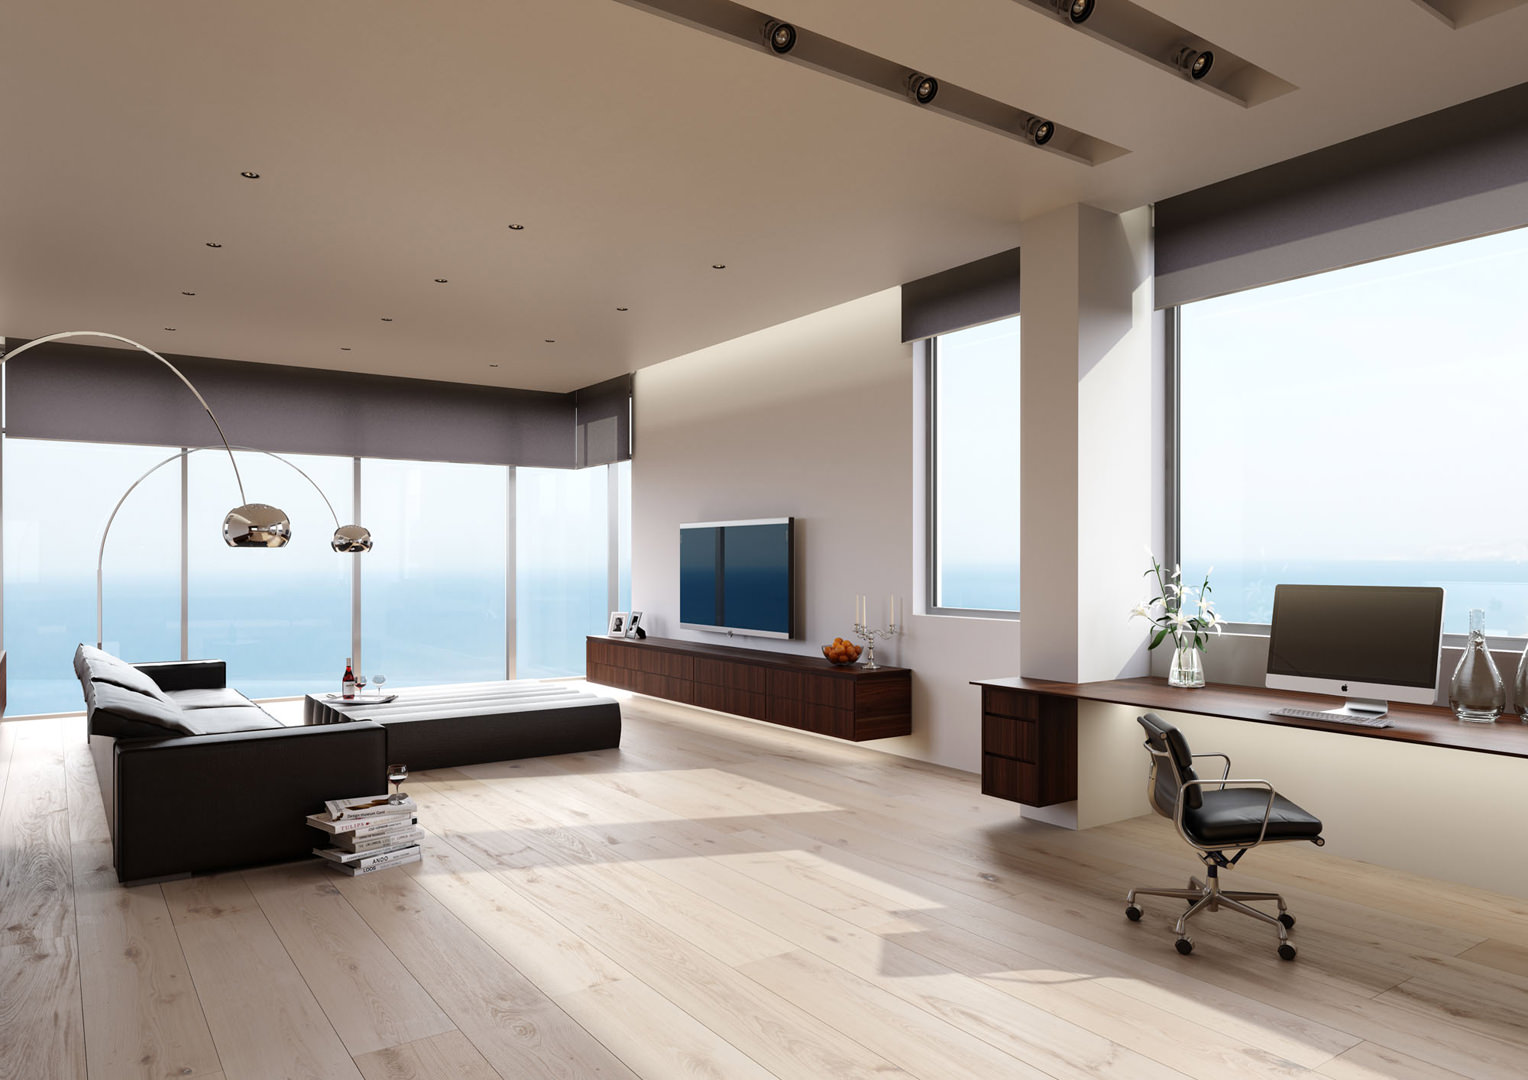 1429 interior lounge